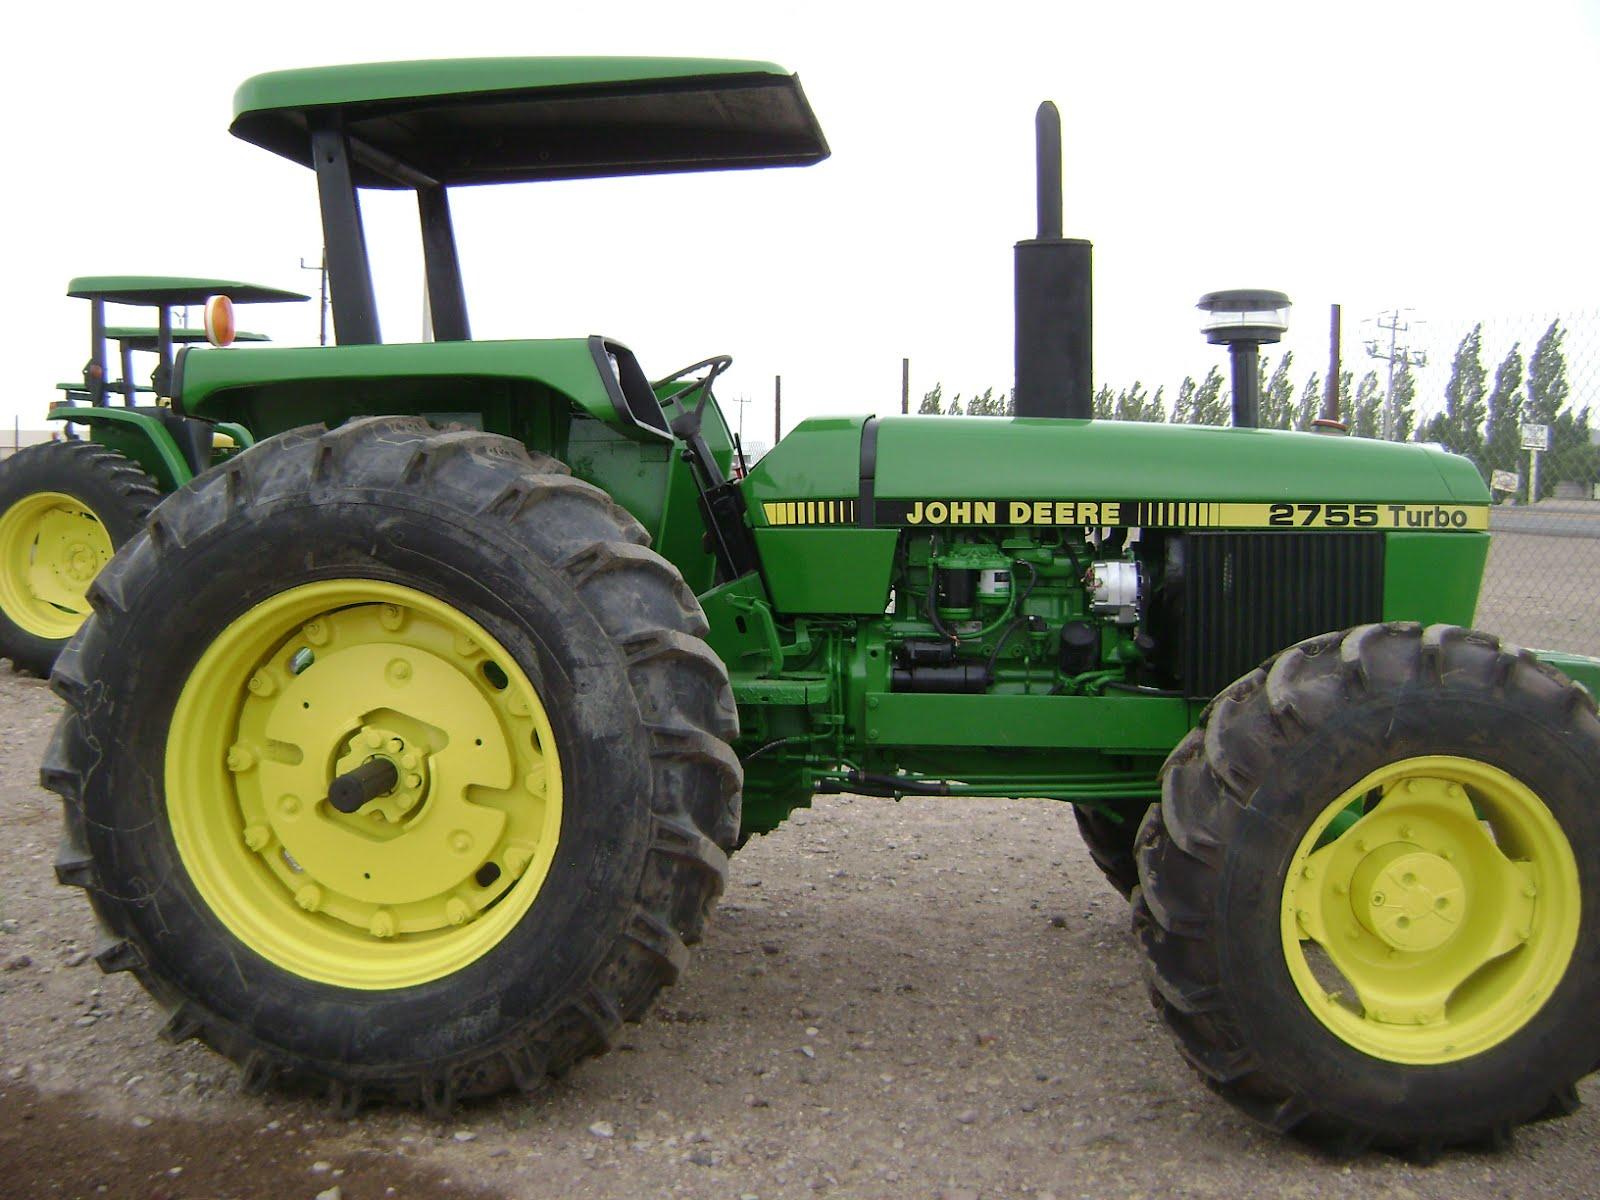 Maquinaria Agricola Industrial  Tractor John Deere 2755 Turbo Sincron 4x4  19 000 Dlls